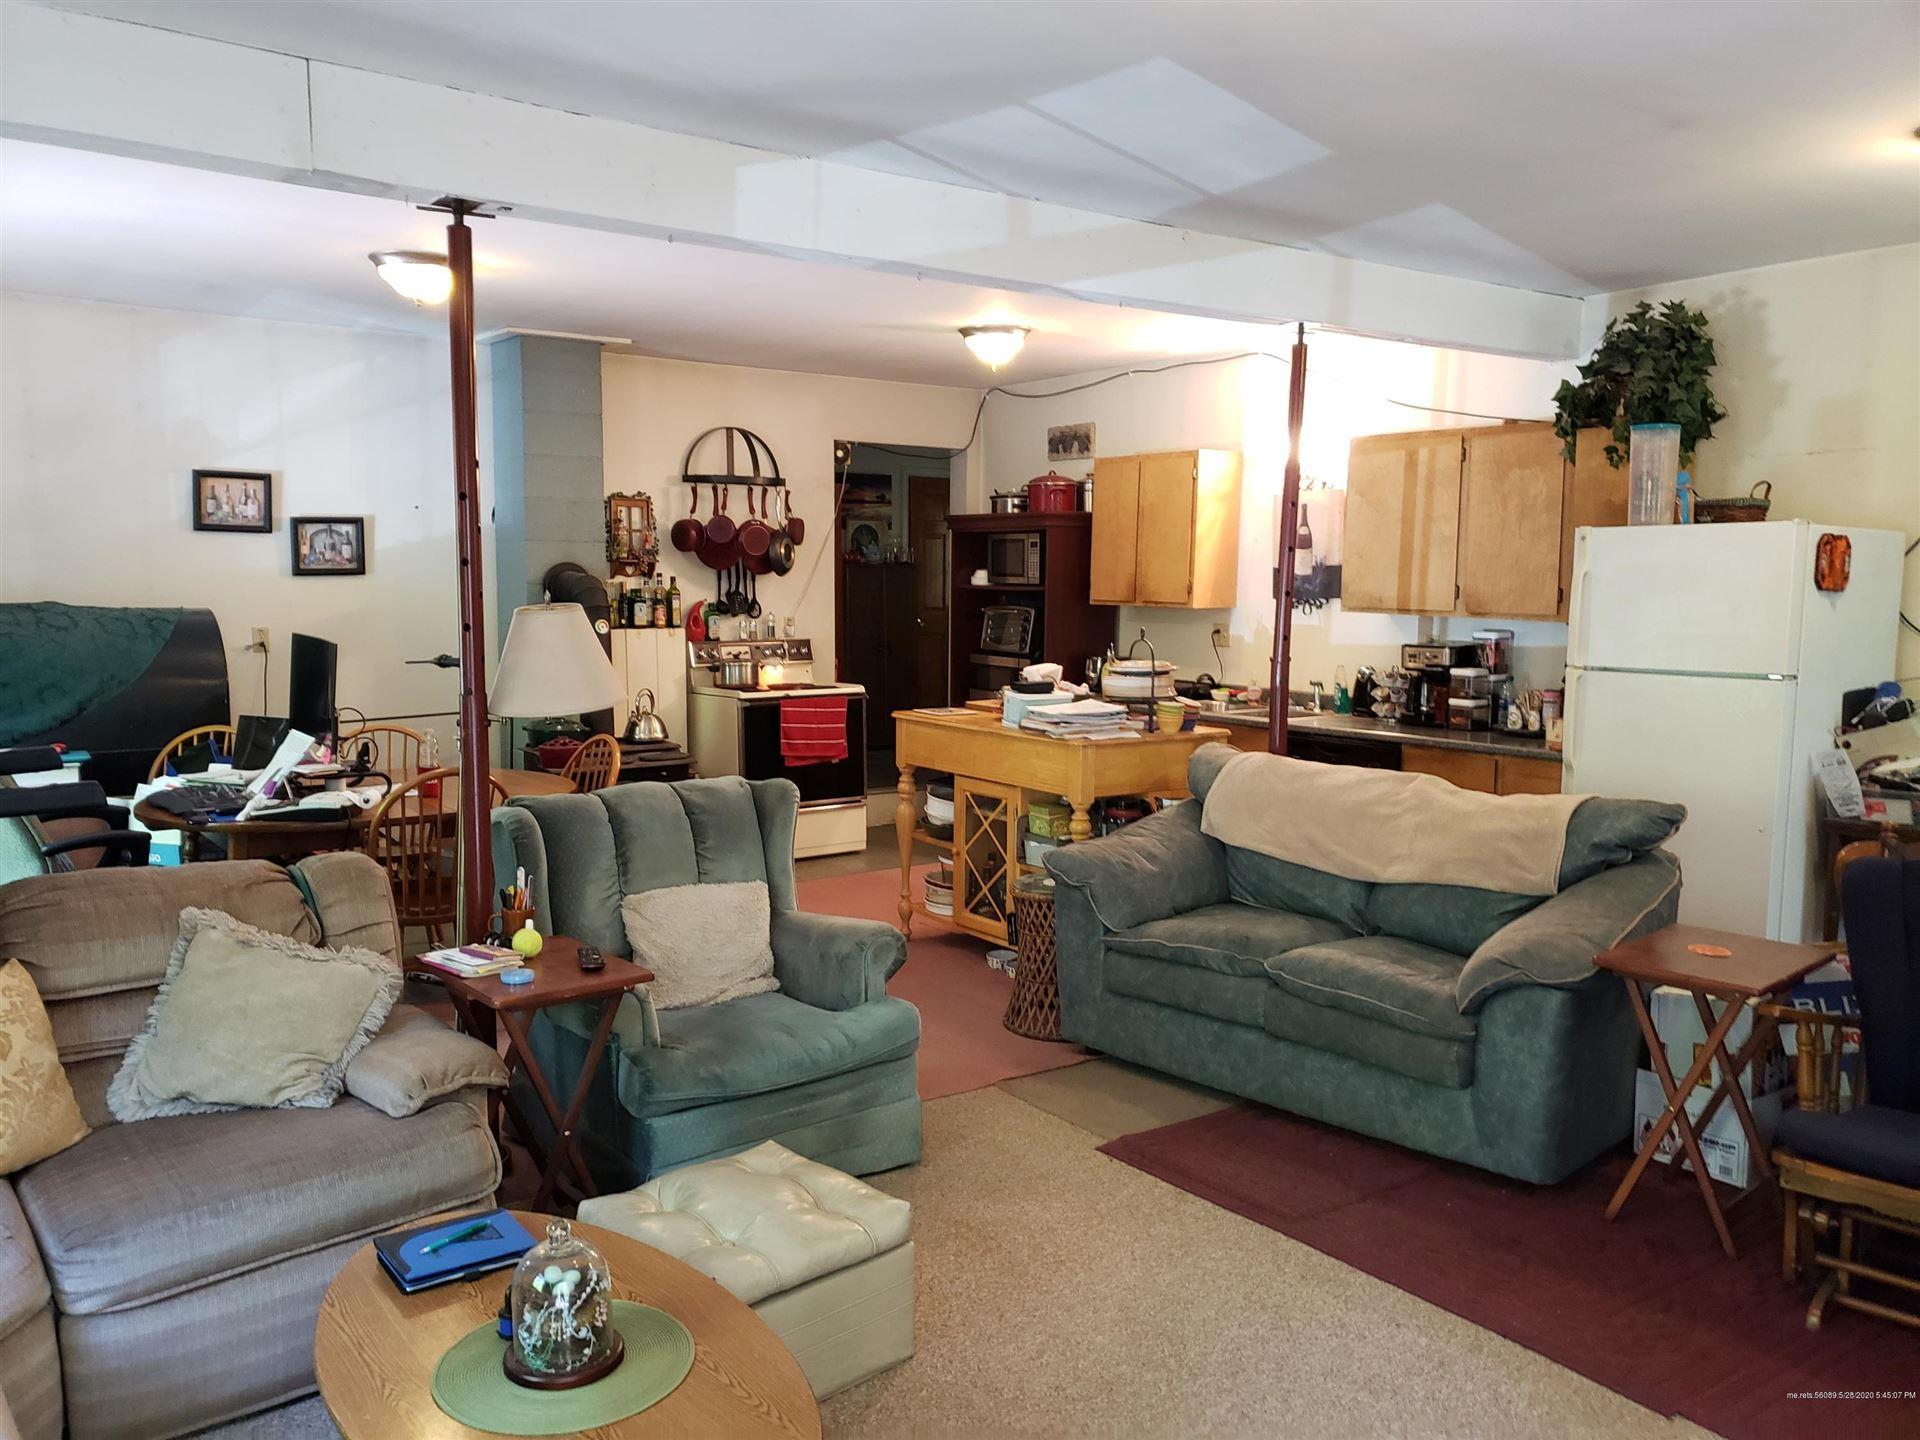 Photo of 81 Burrill Hill Road, Skowhegan, ME 04976 (MLS # 1453945)